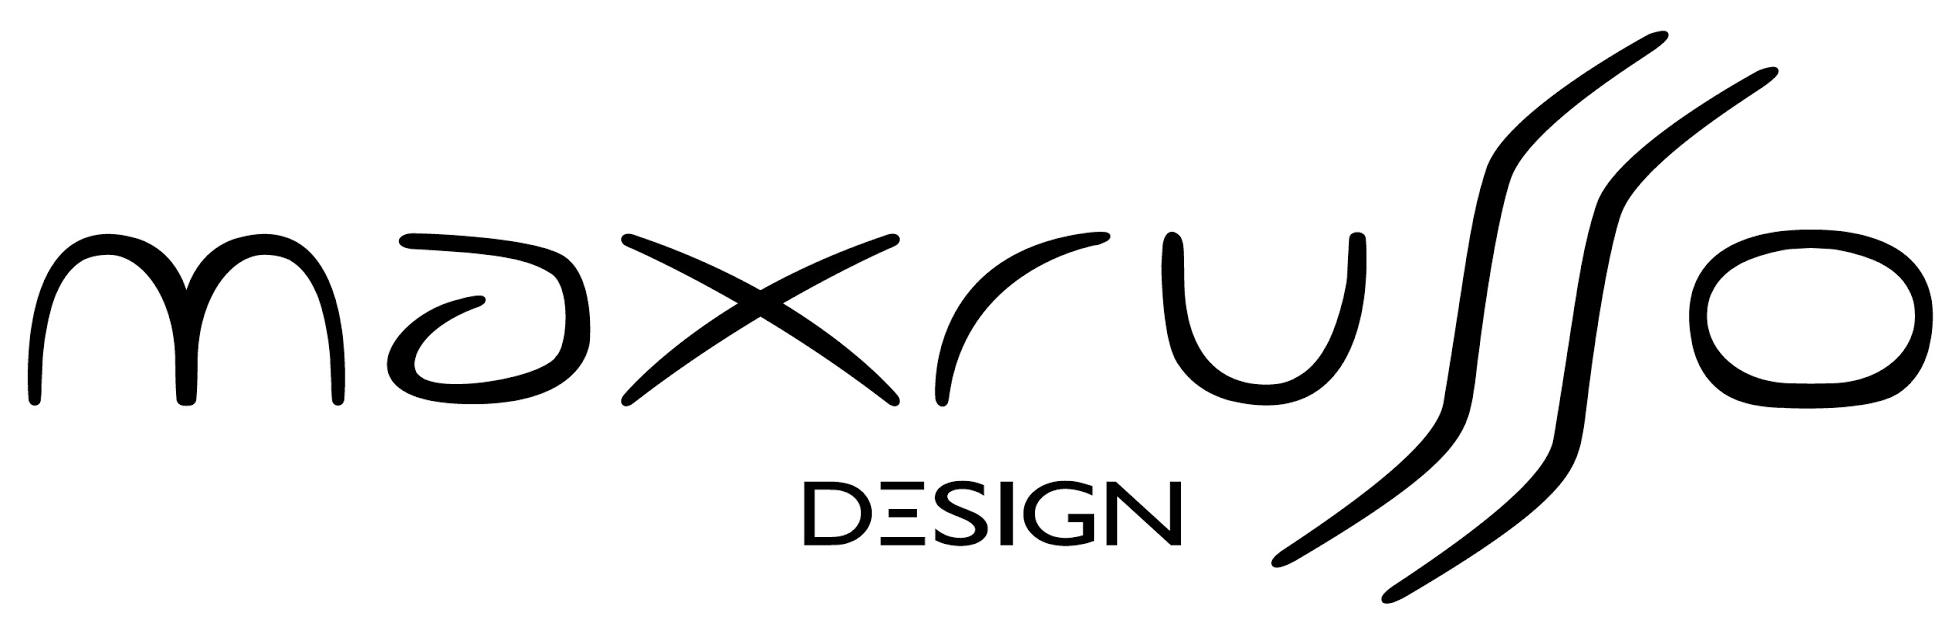 Max Russo Design